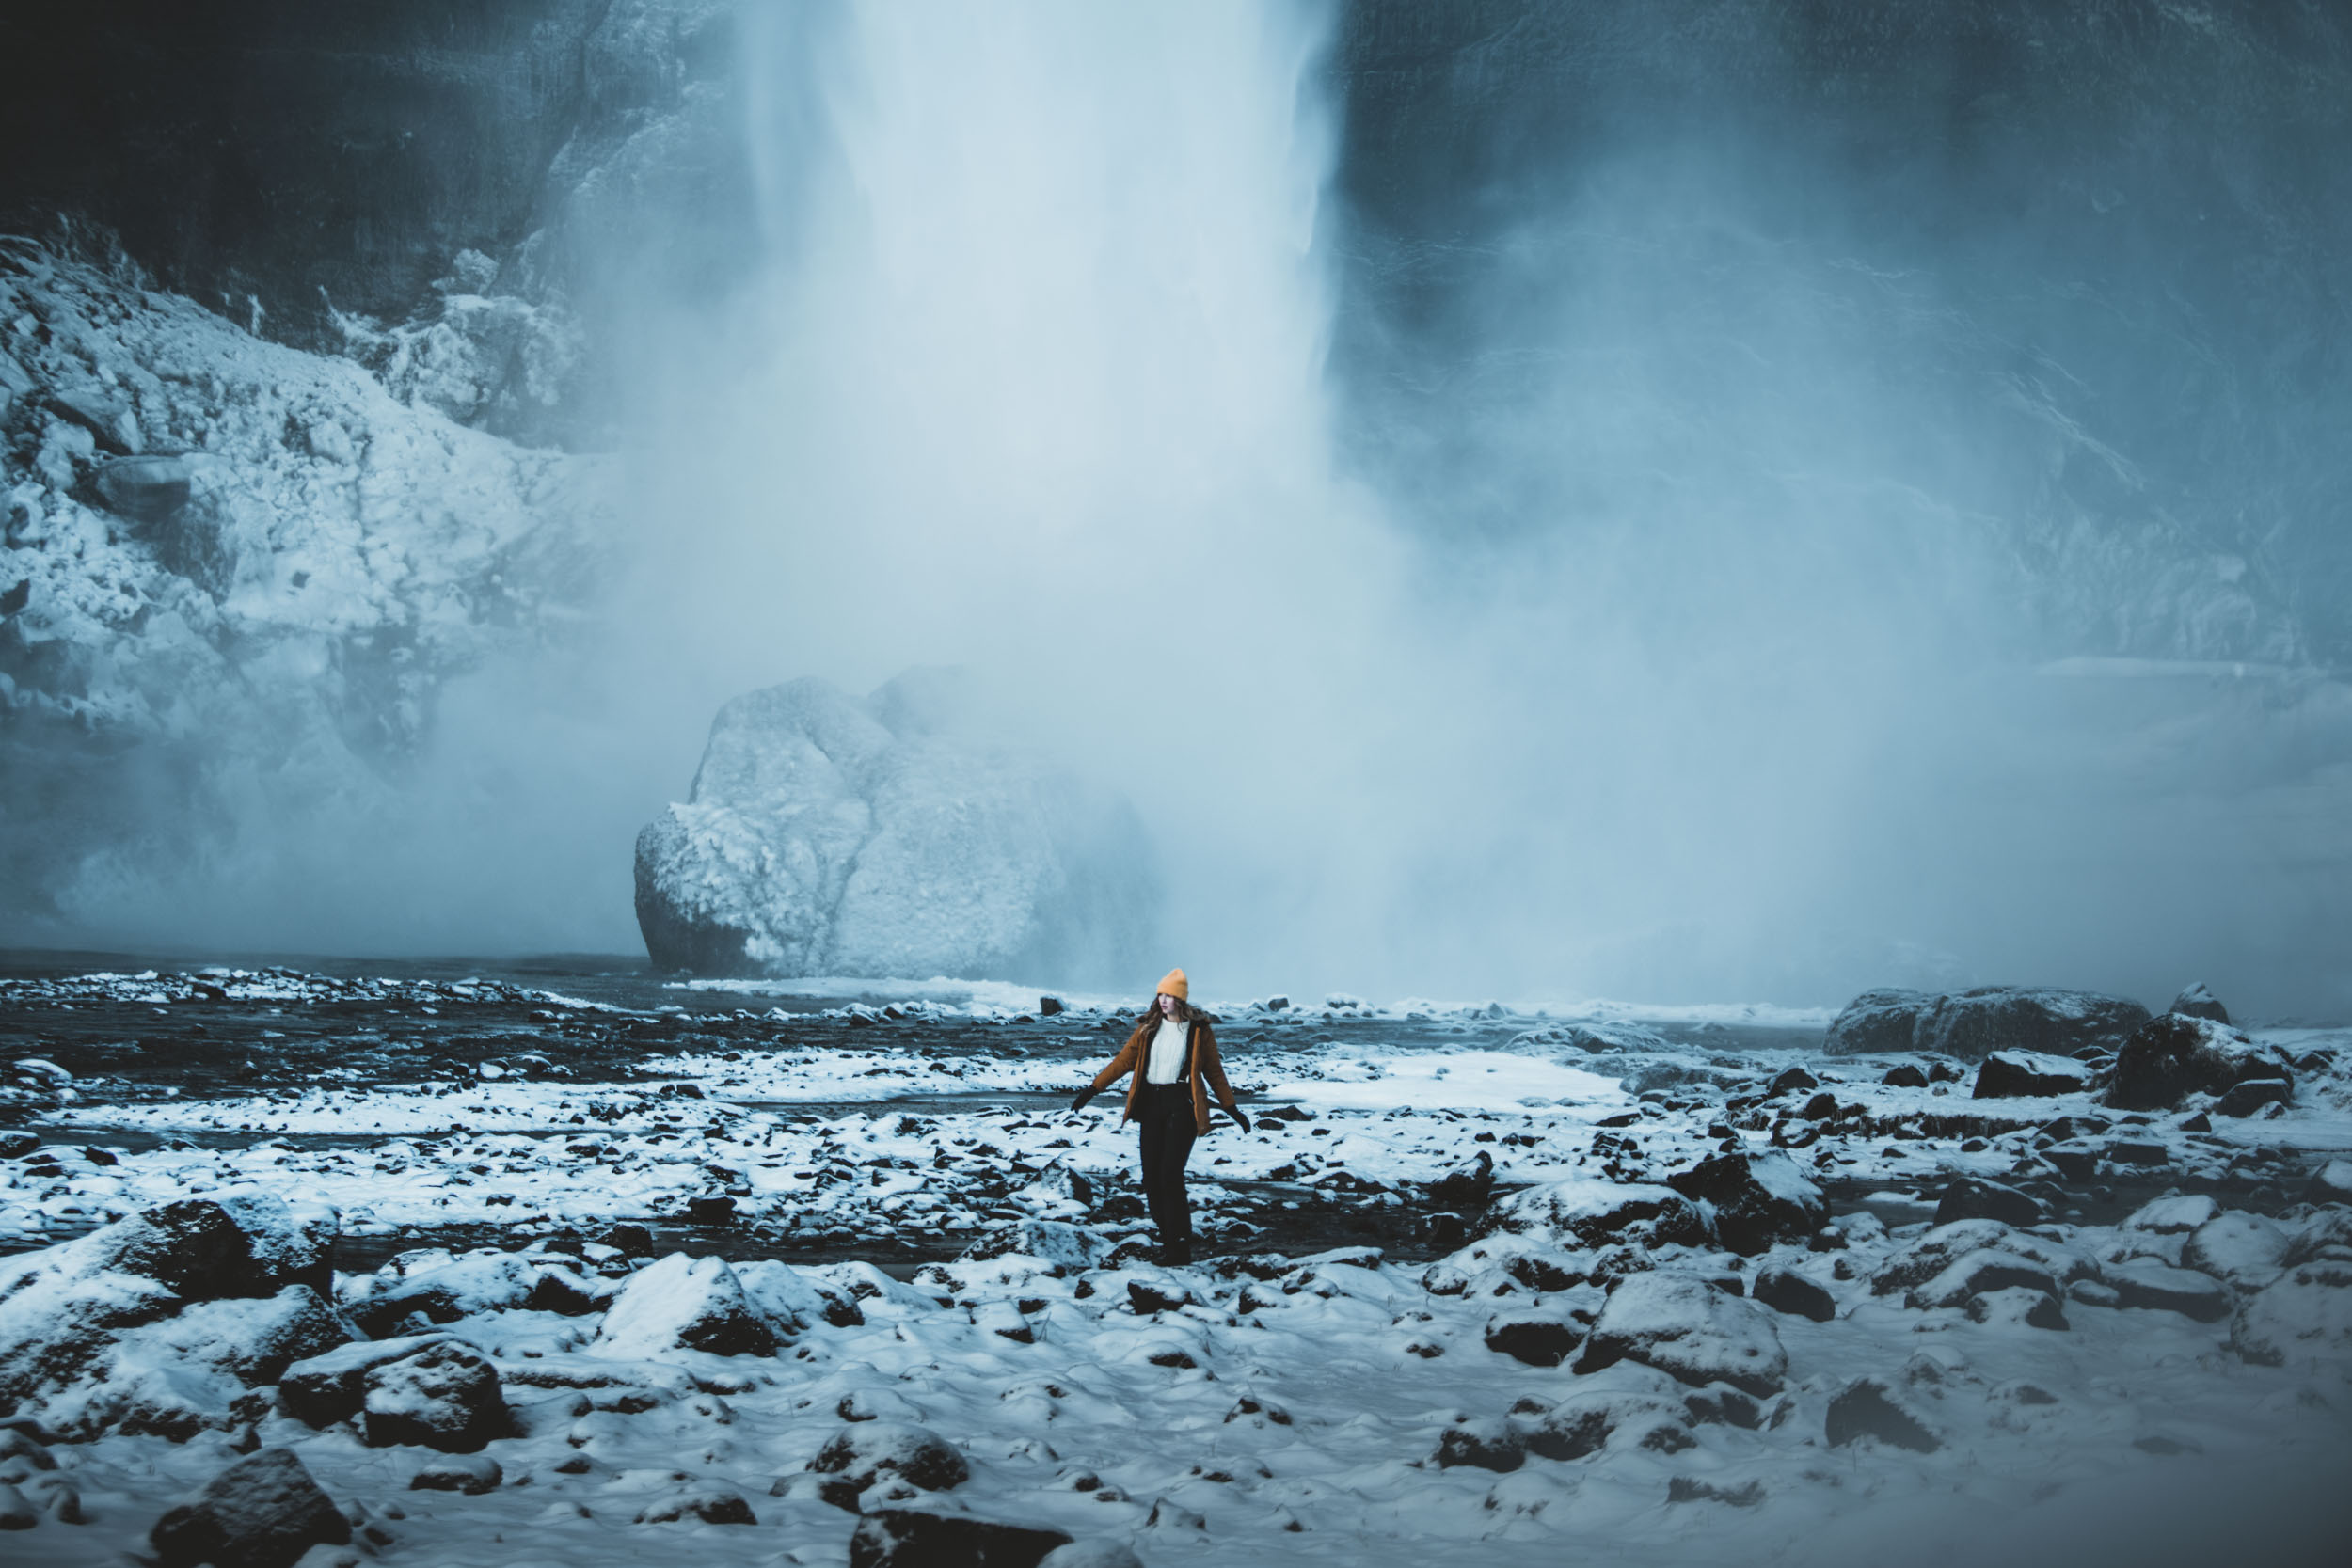 Iceland_Jan_2019_ByTomKahler_Lowres (236 of 262).jpg